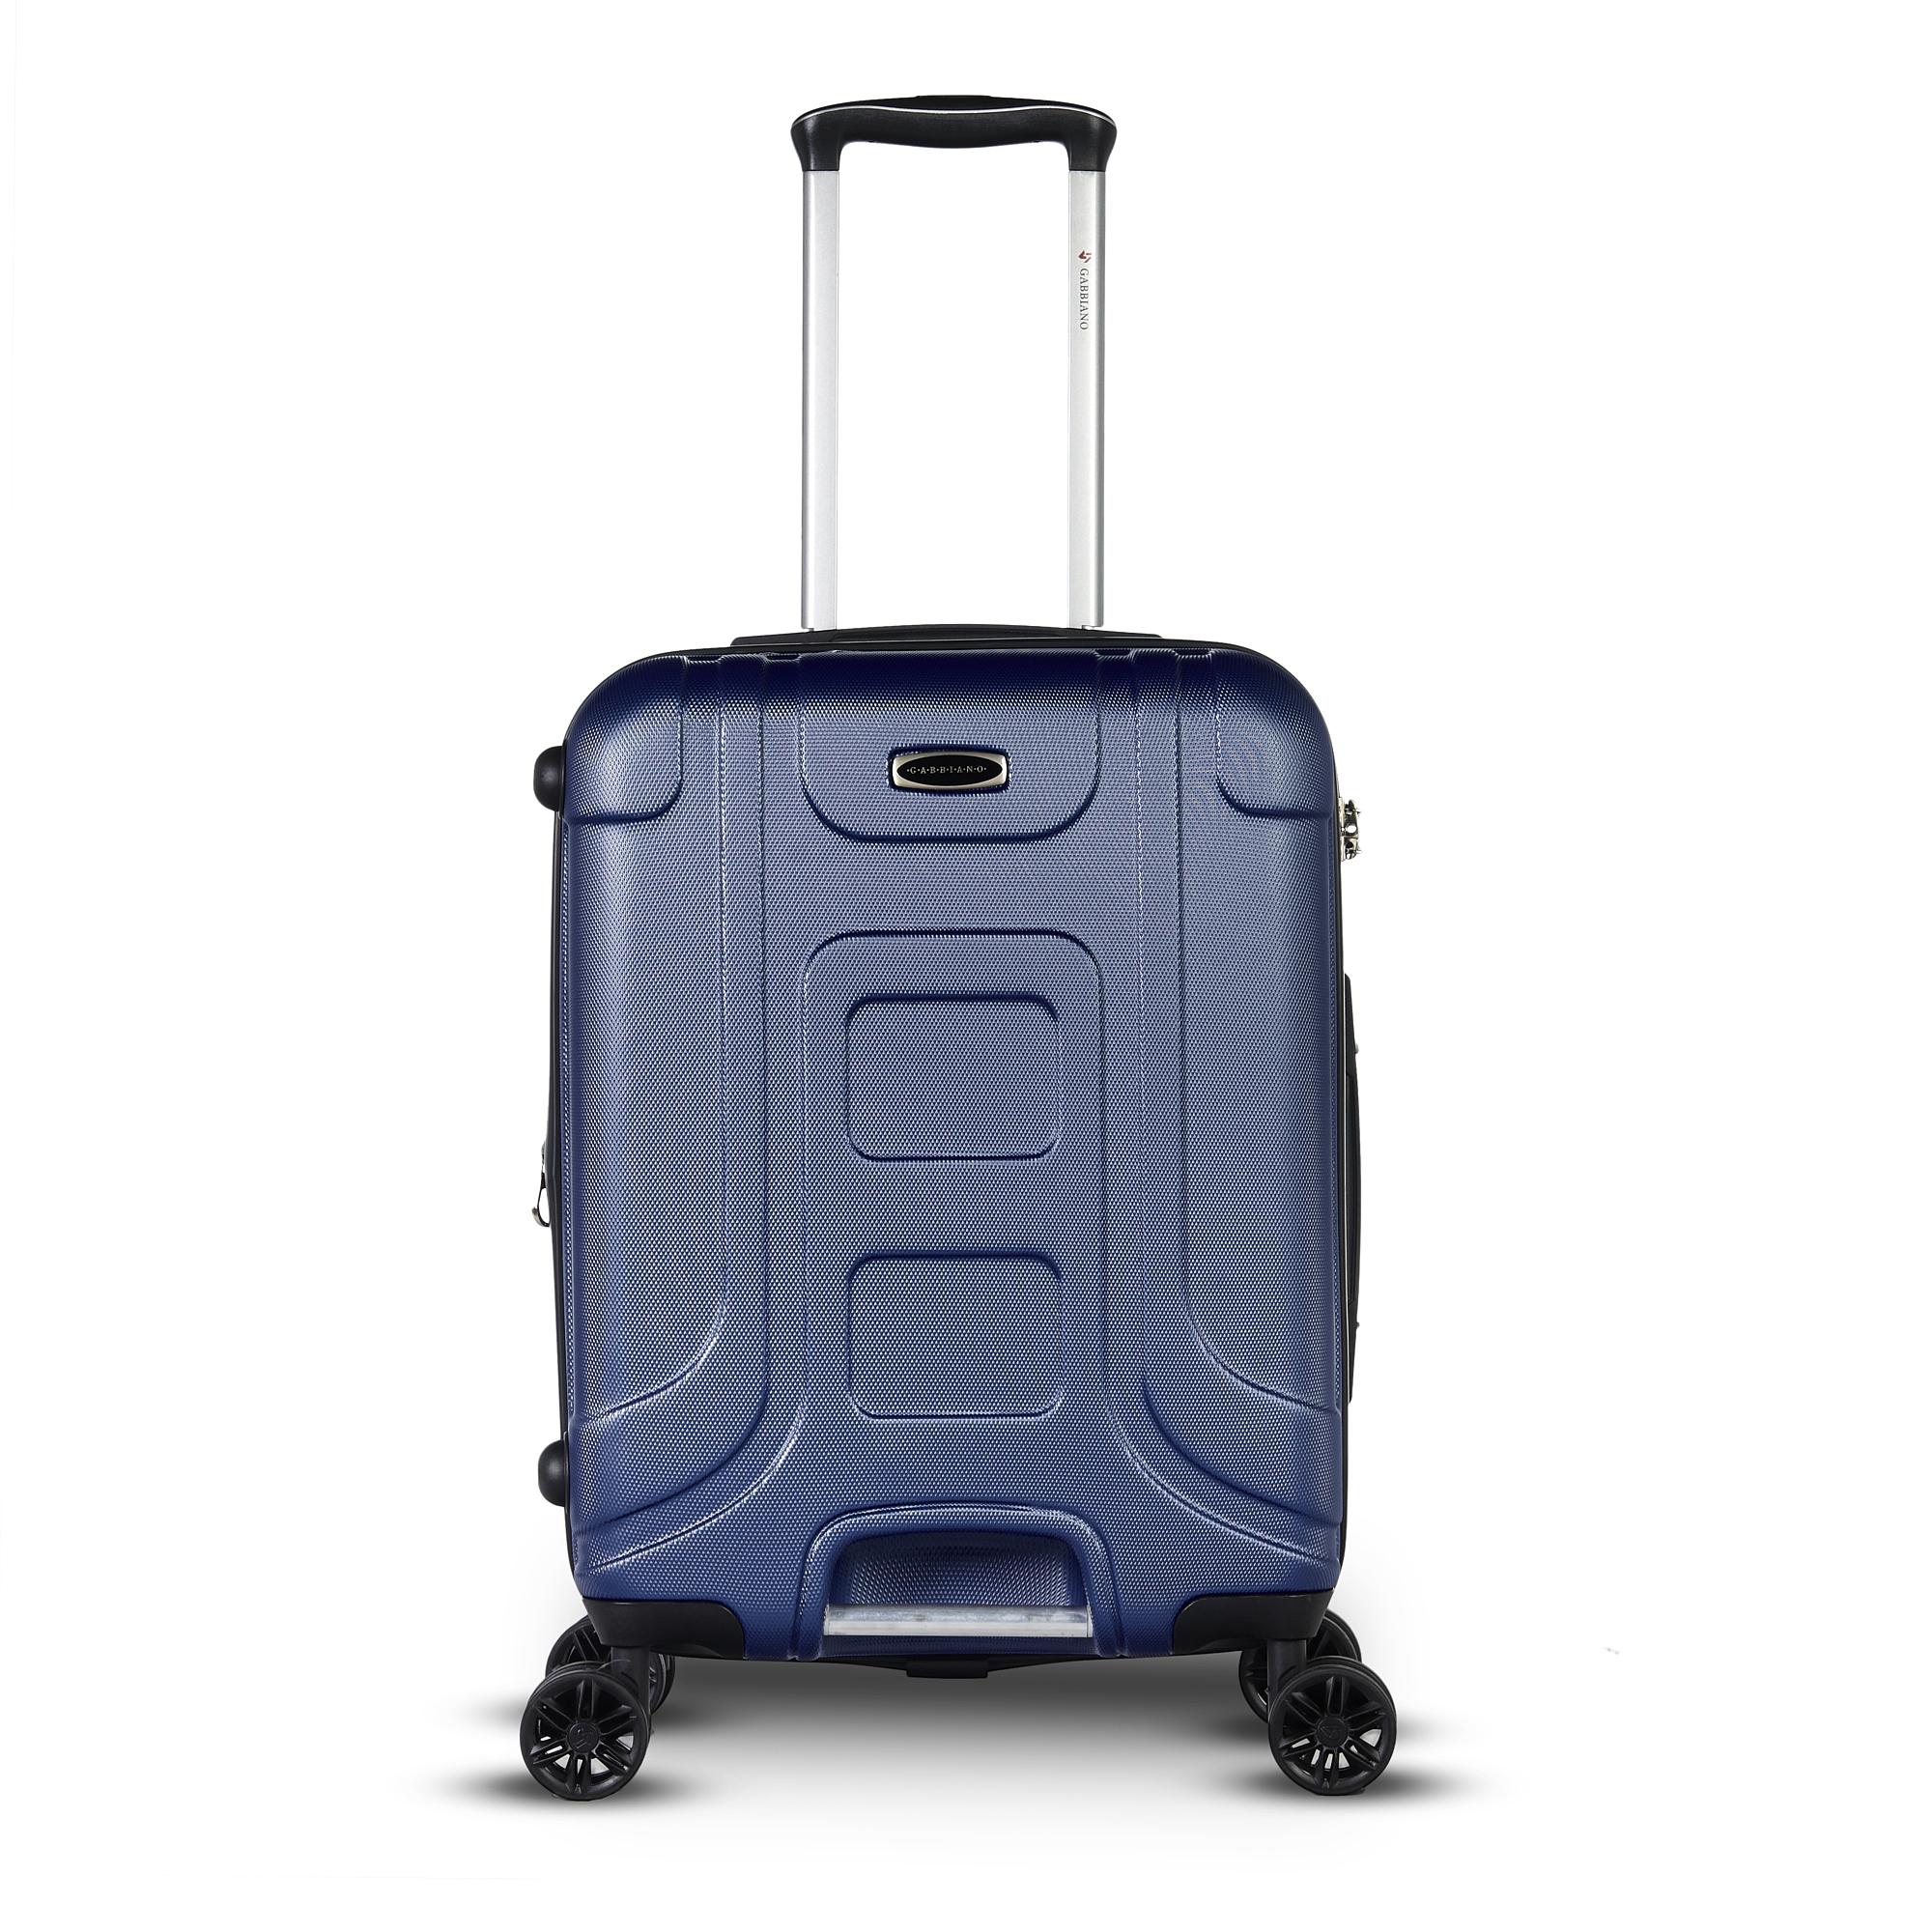 LG_GA2150_BLUE_FRONT